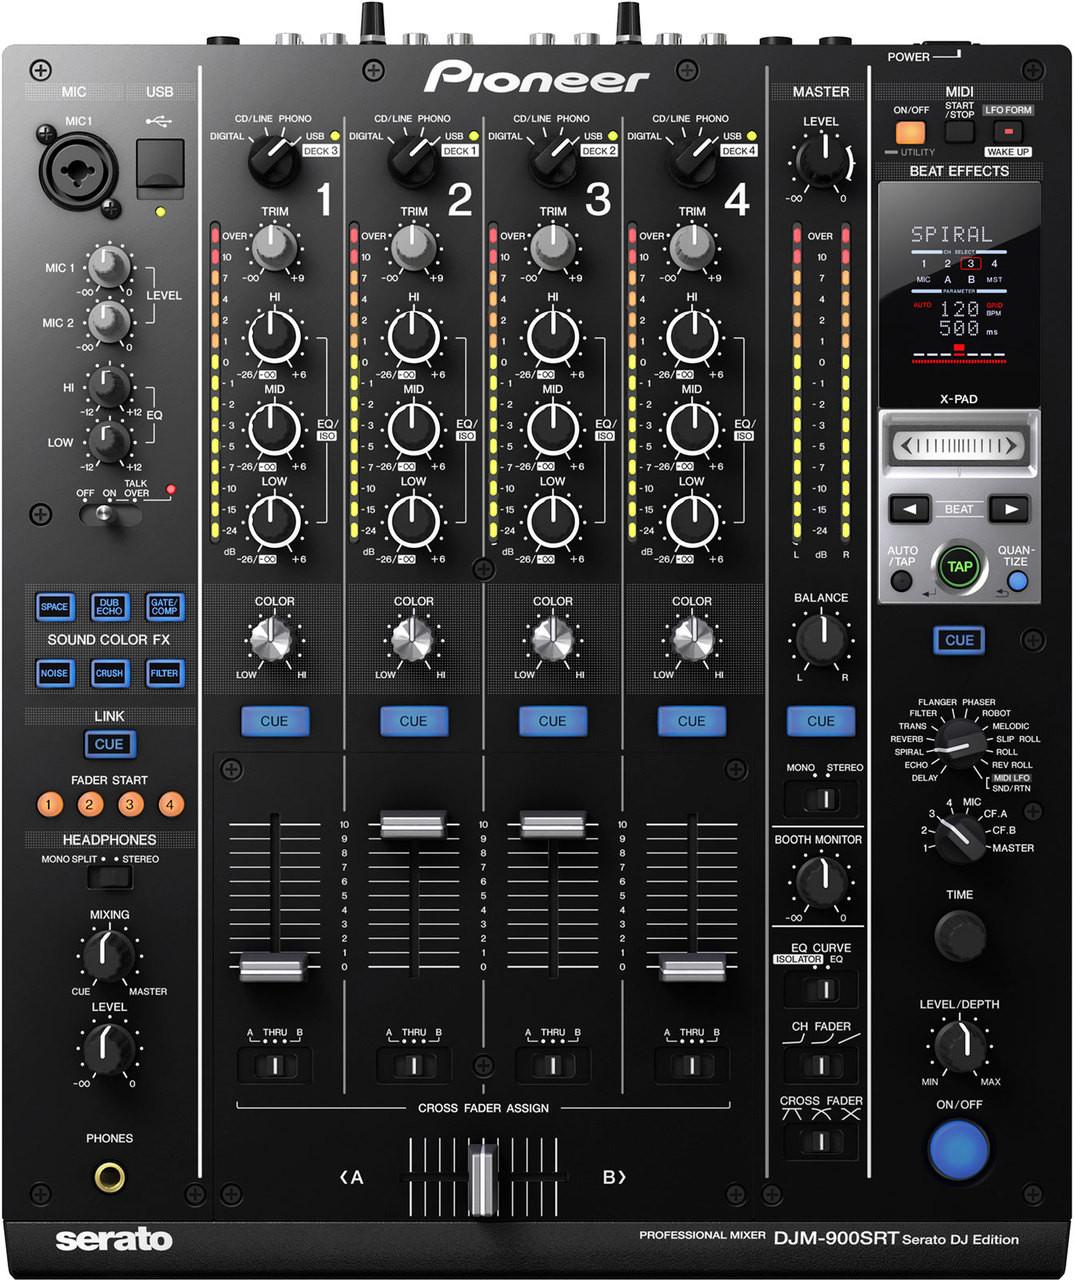 Pioneer DJM-900SRT Serato DJ Edition DJ Controller Driver for Mac